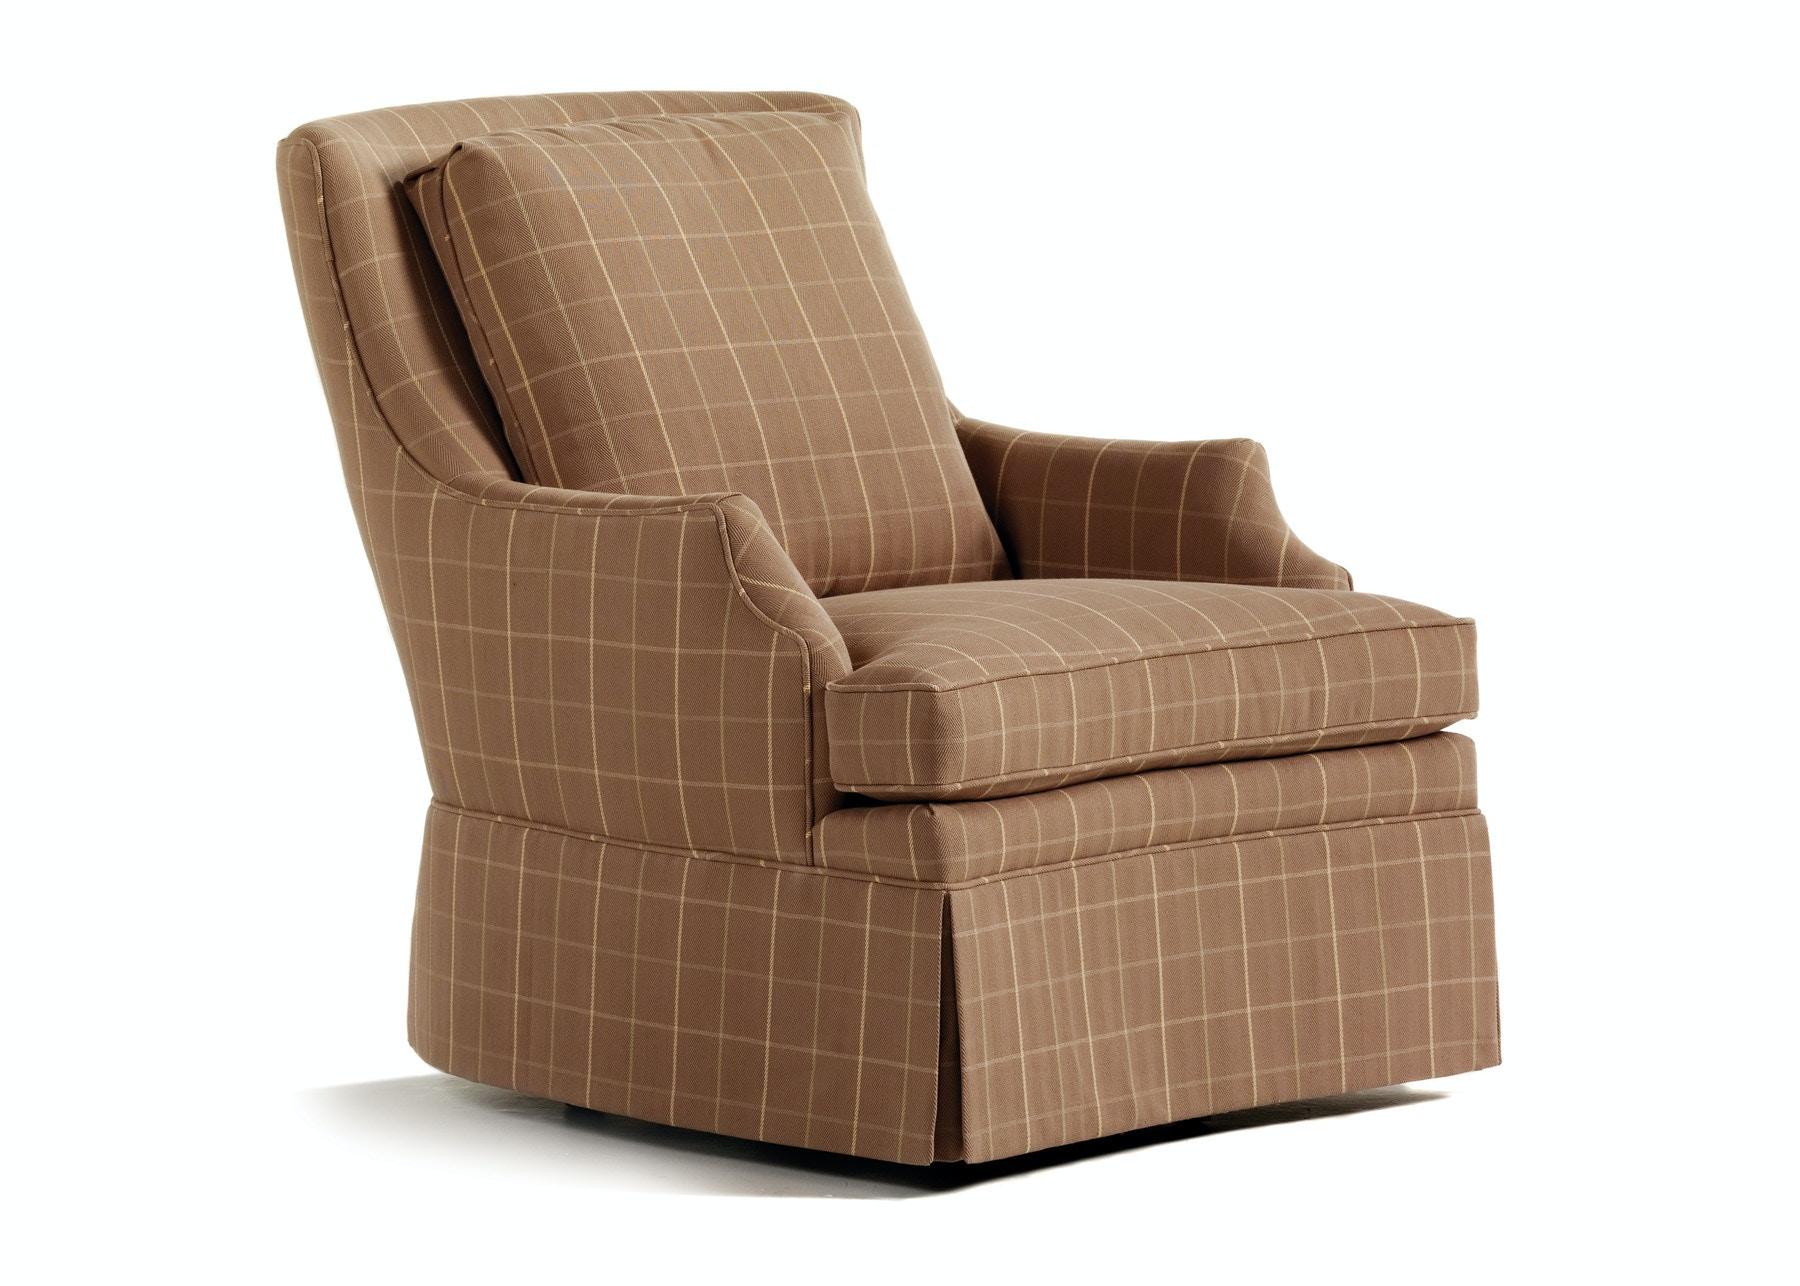 swivel chair quotes kijiji winnipeg jessica charles living room lacey rocker 142 sr